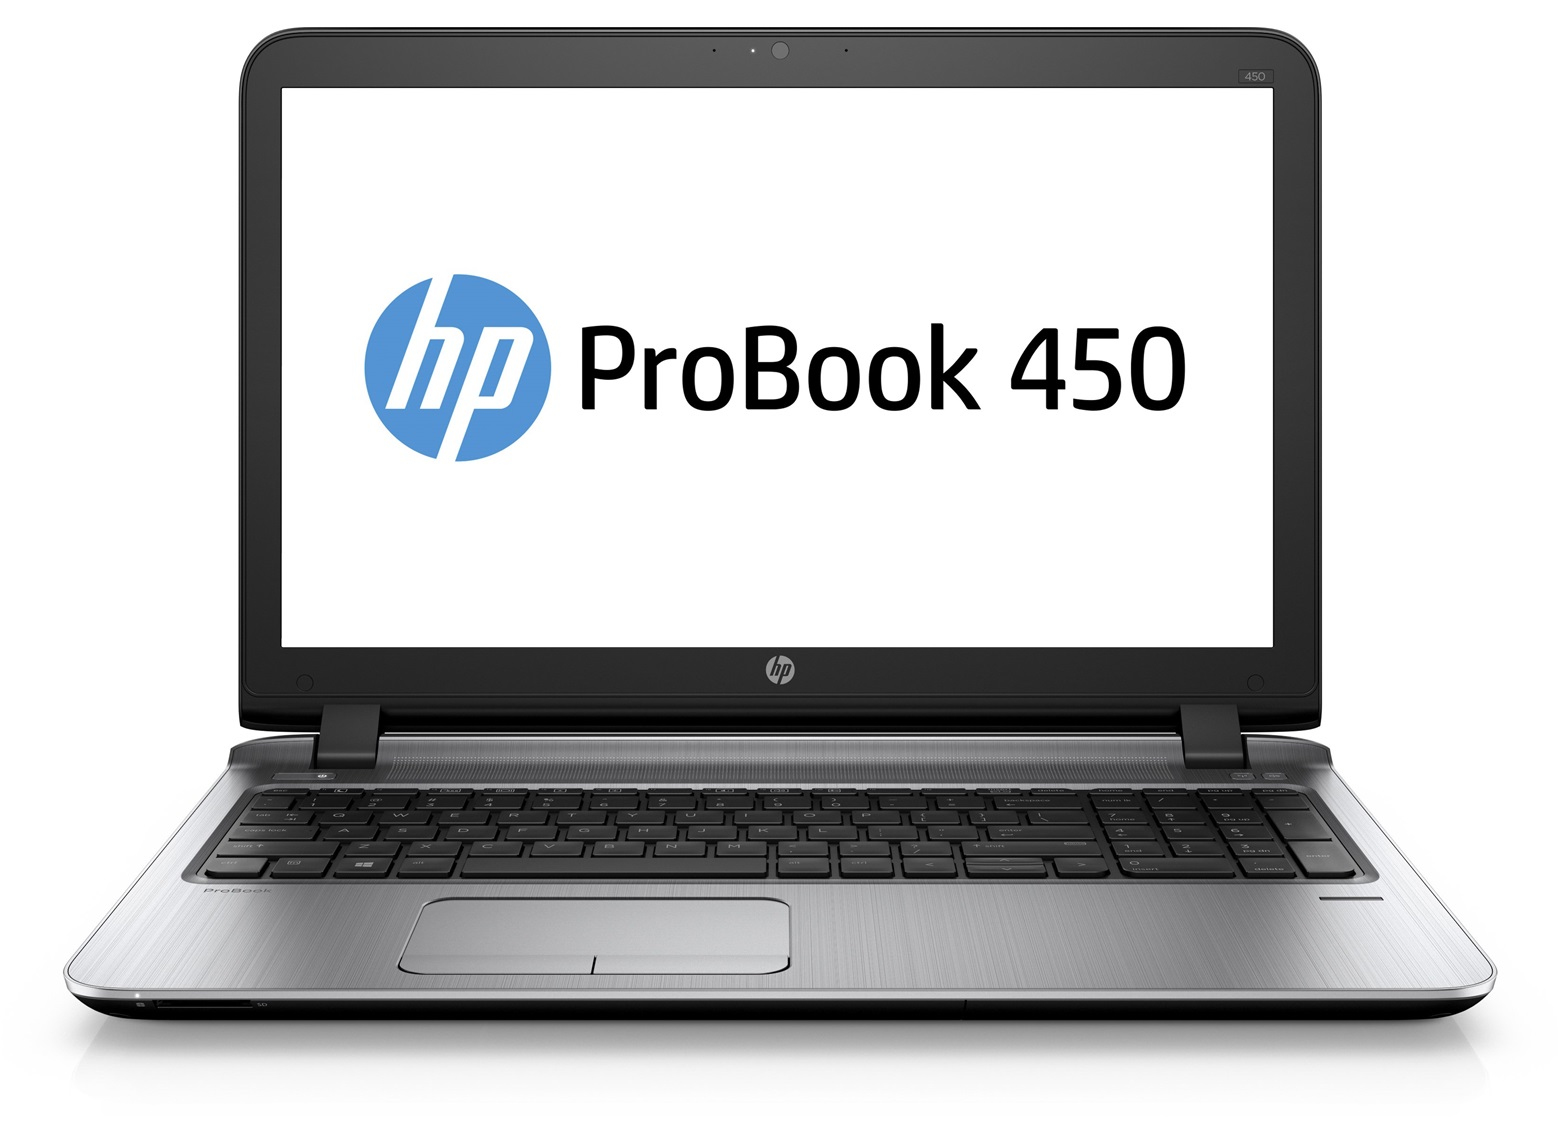 HP HP ProBook 450 G3 2.3GHz i5-6200U 15.6